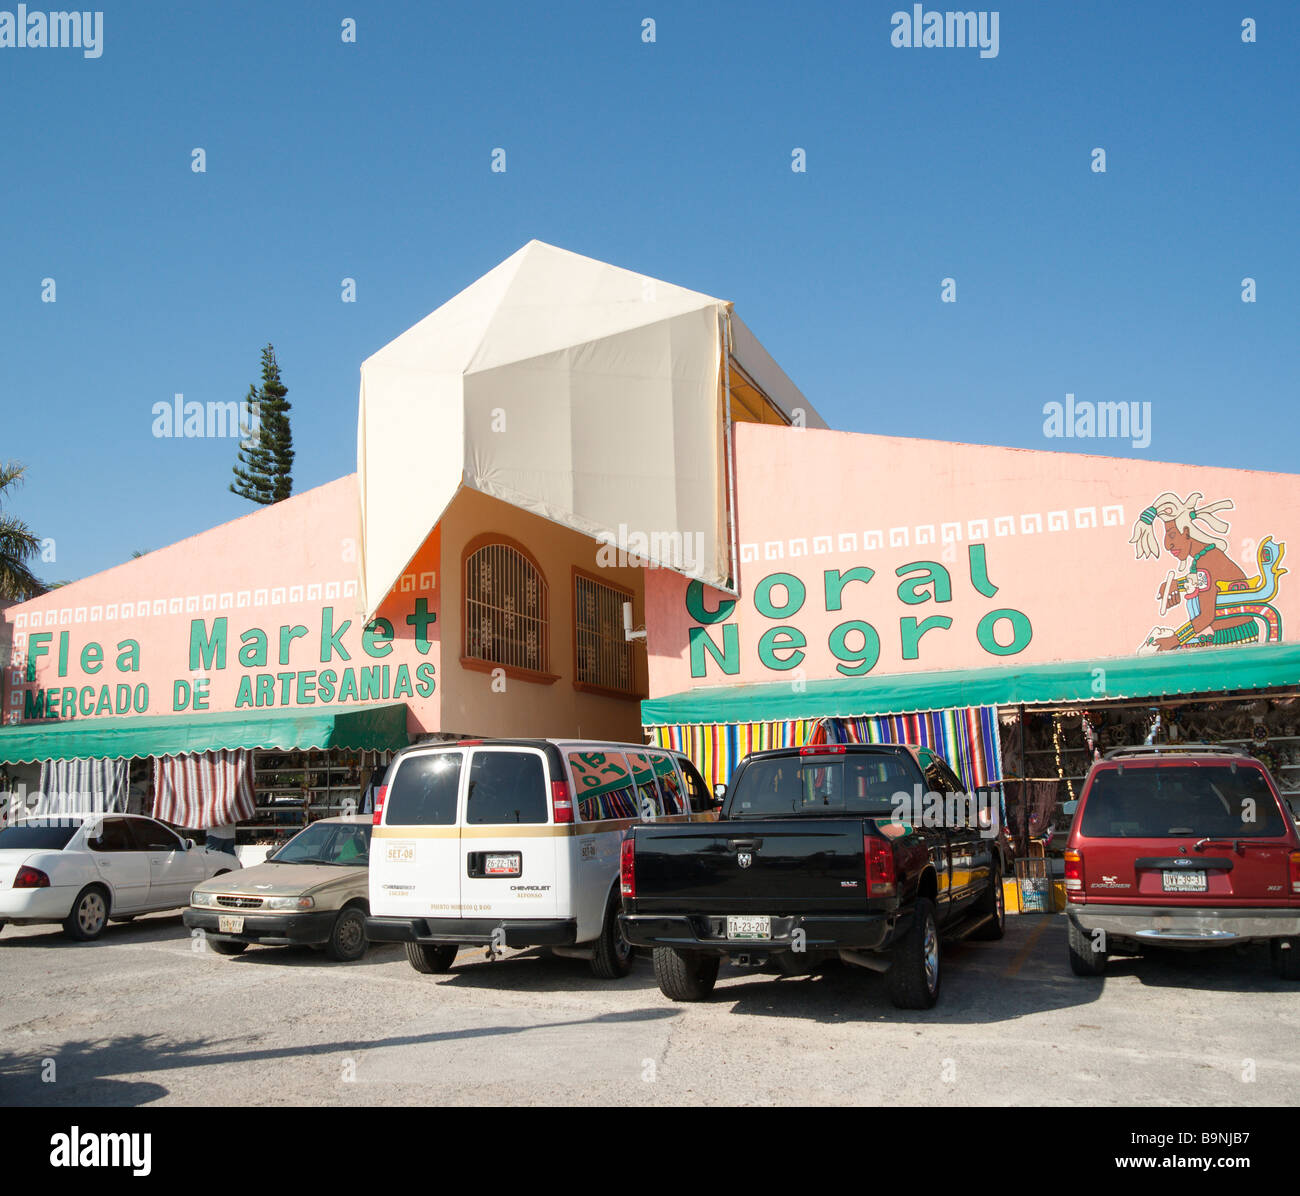 Mexico Yucatan - Cancun zona hotelara or hotel zone main centre near the Forum shopping mall the fleamarket Stock Photo